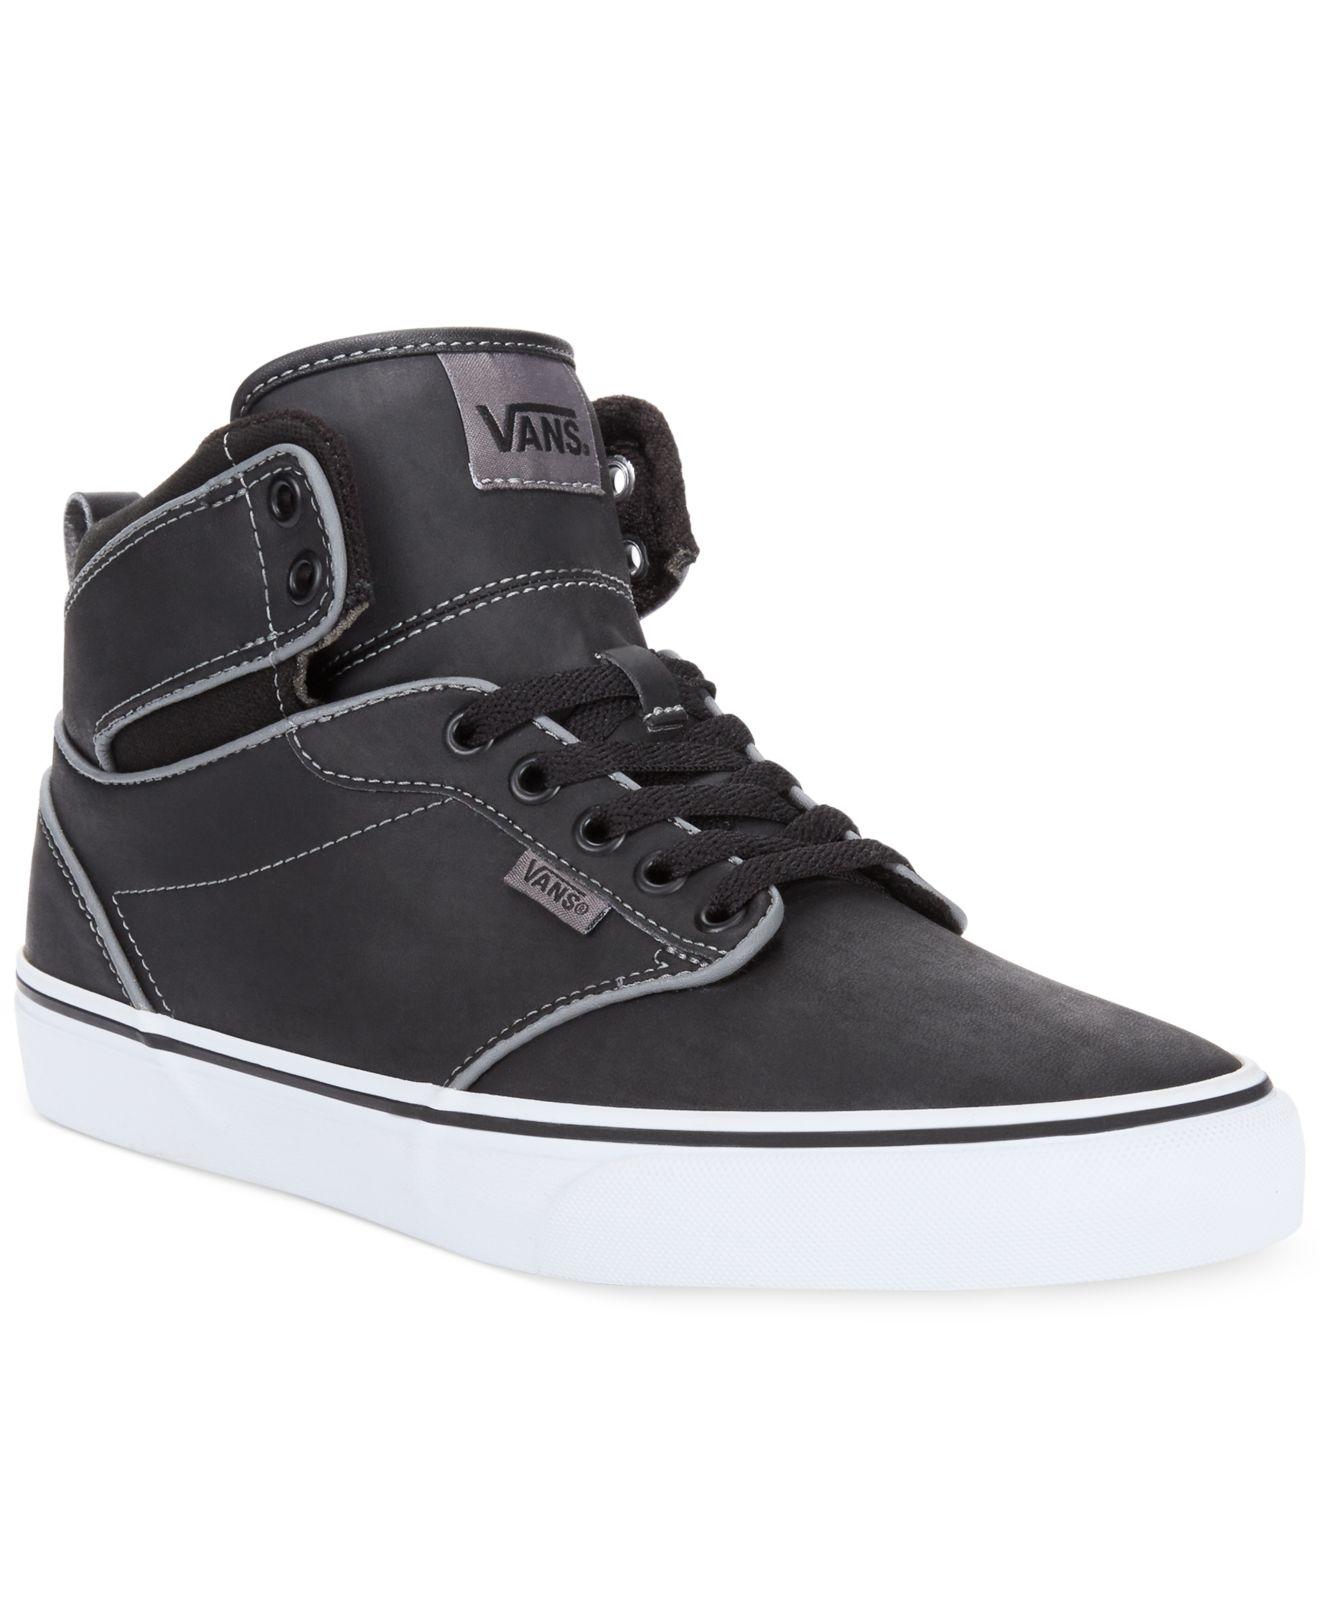 efdadc5bc753ea Lyst - Vans Atwood Hi-Top Sneakers in Black for Men